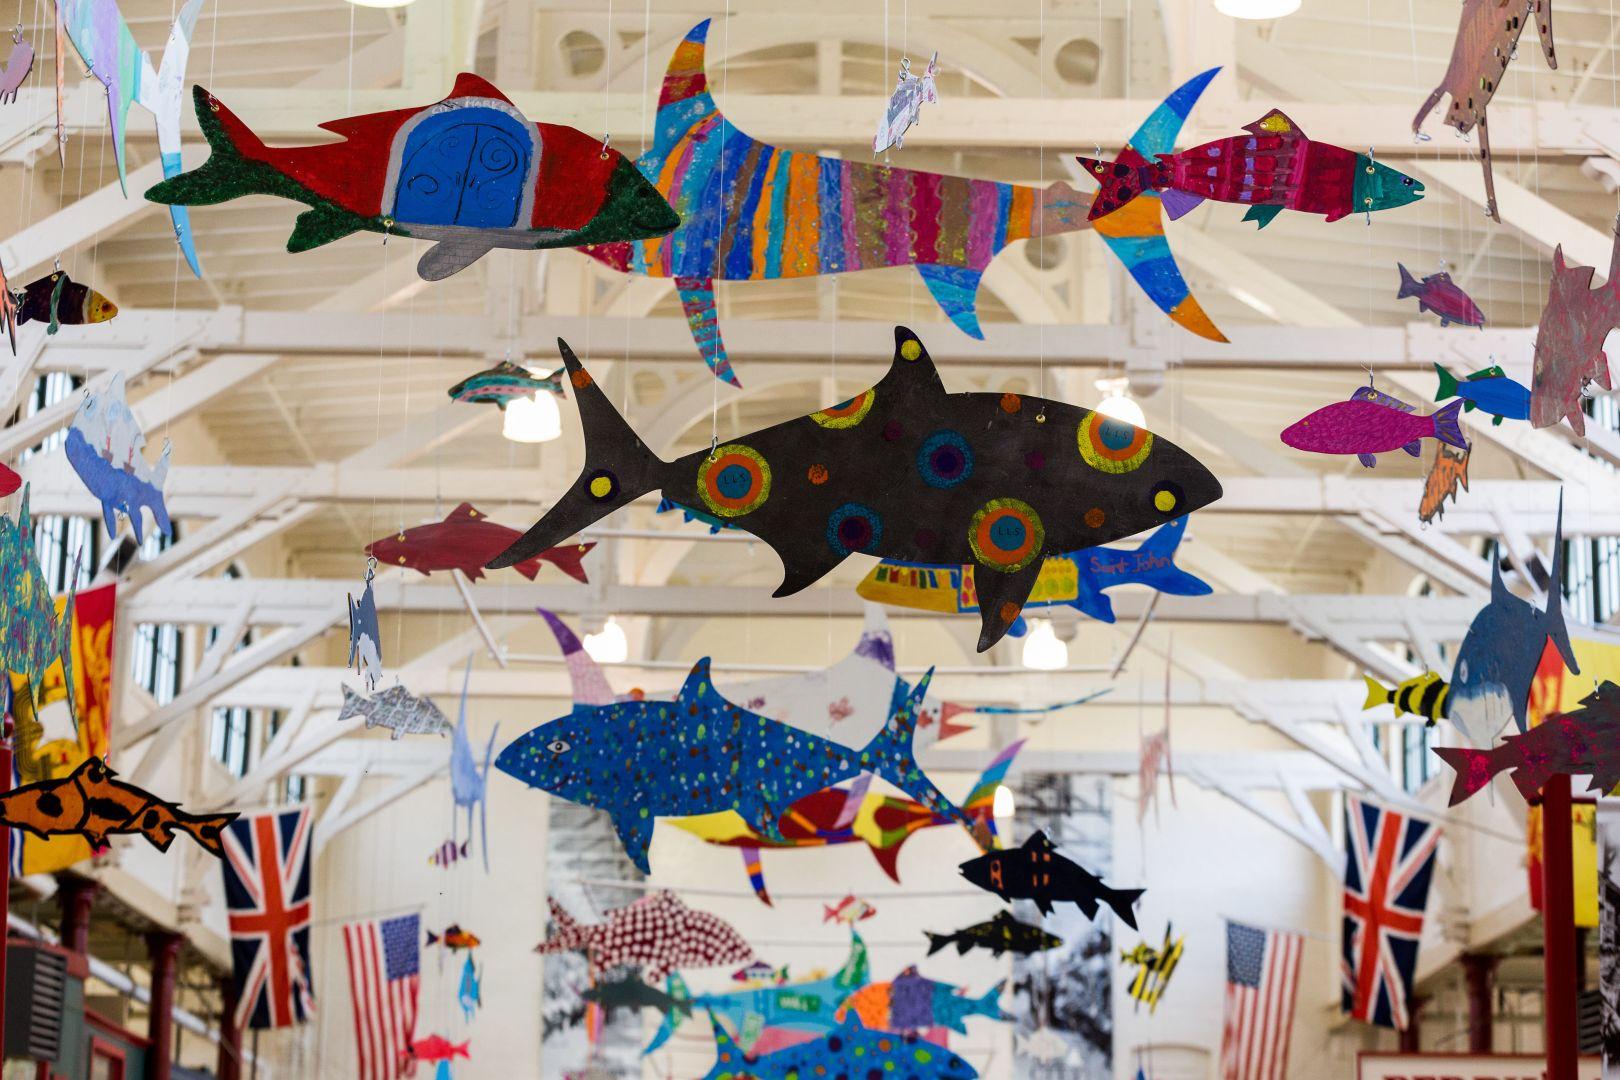 A photo of Overhead Decorations at Saint John City Market Photograph